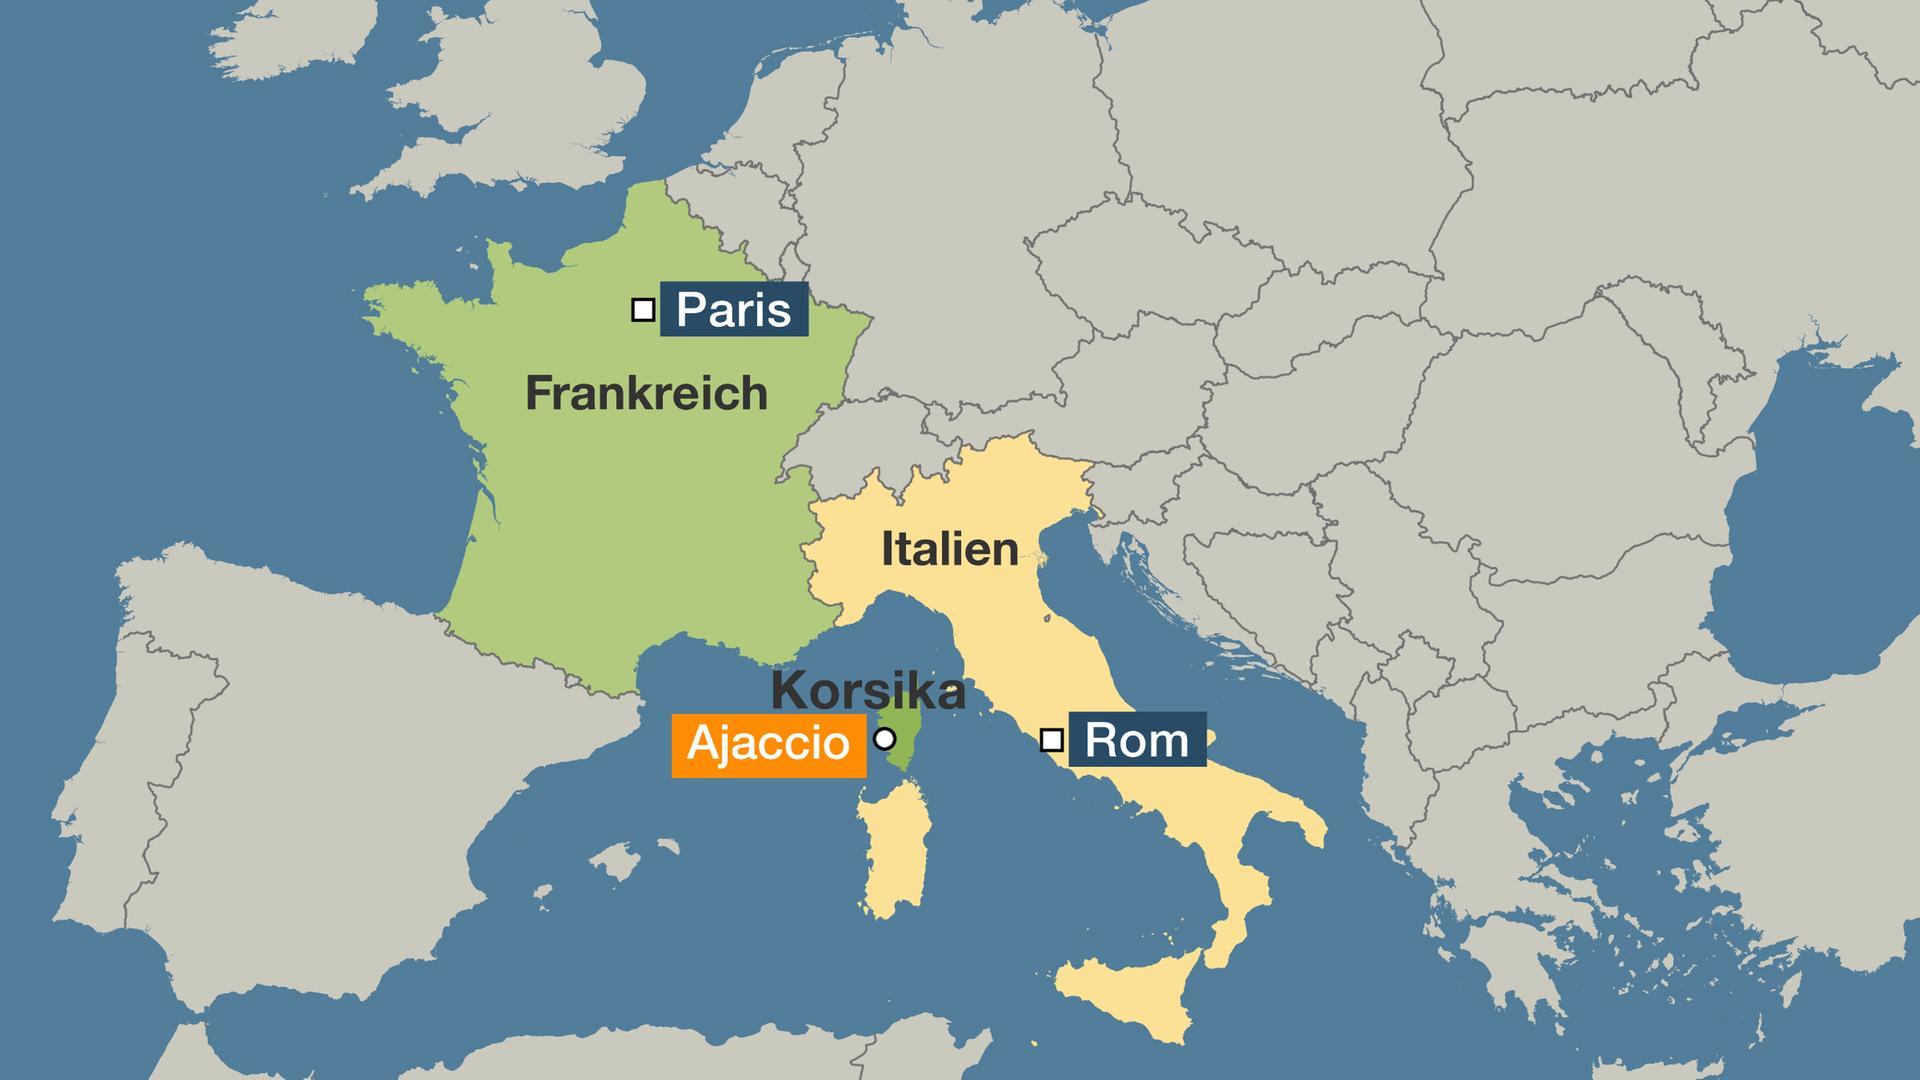 korsika karte 600 Tonnen Treibstoff im Meer: Ölteppich treibt auf Korsika zu  korsika karte